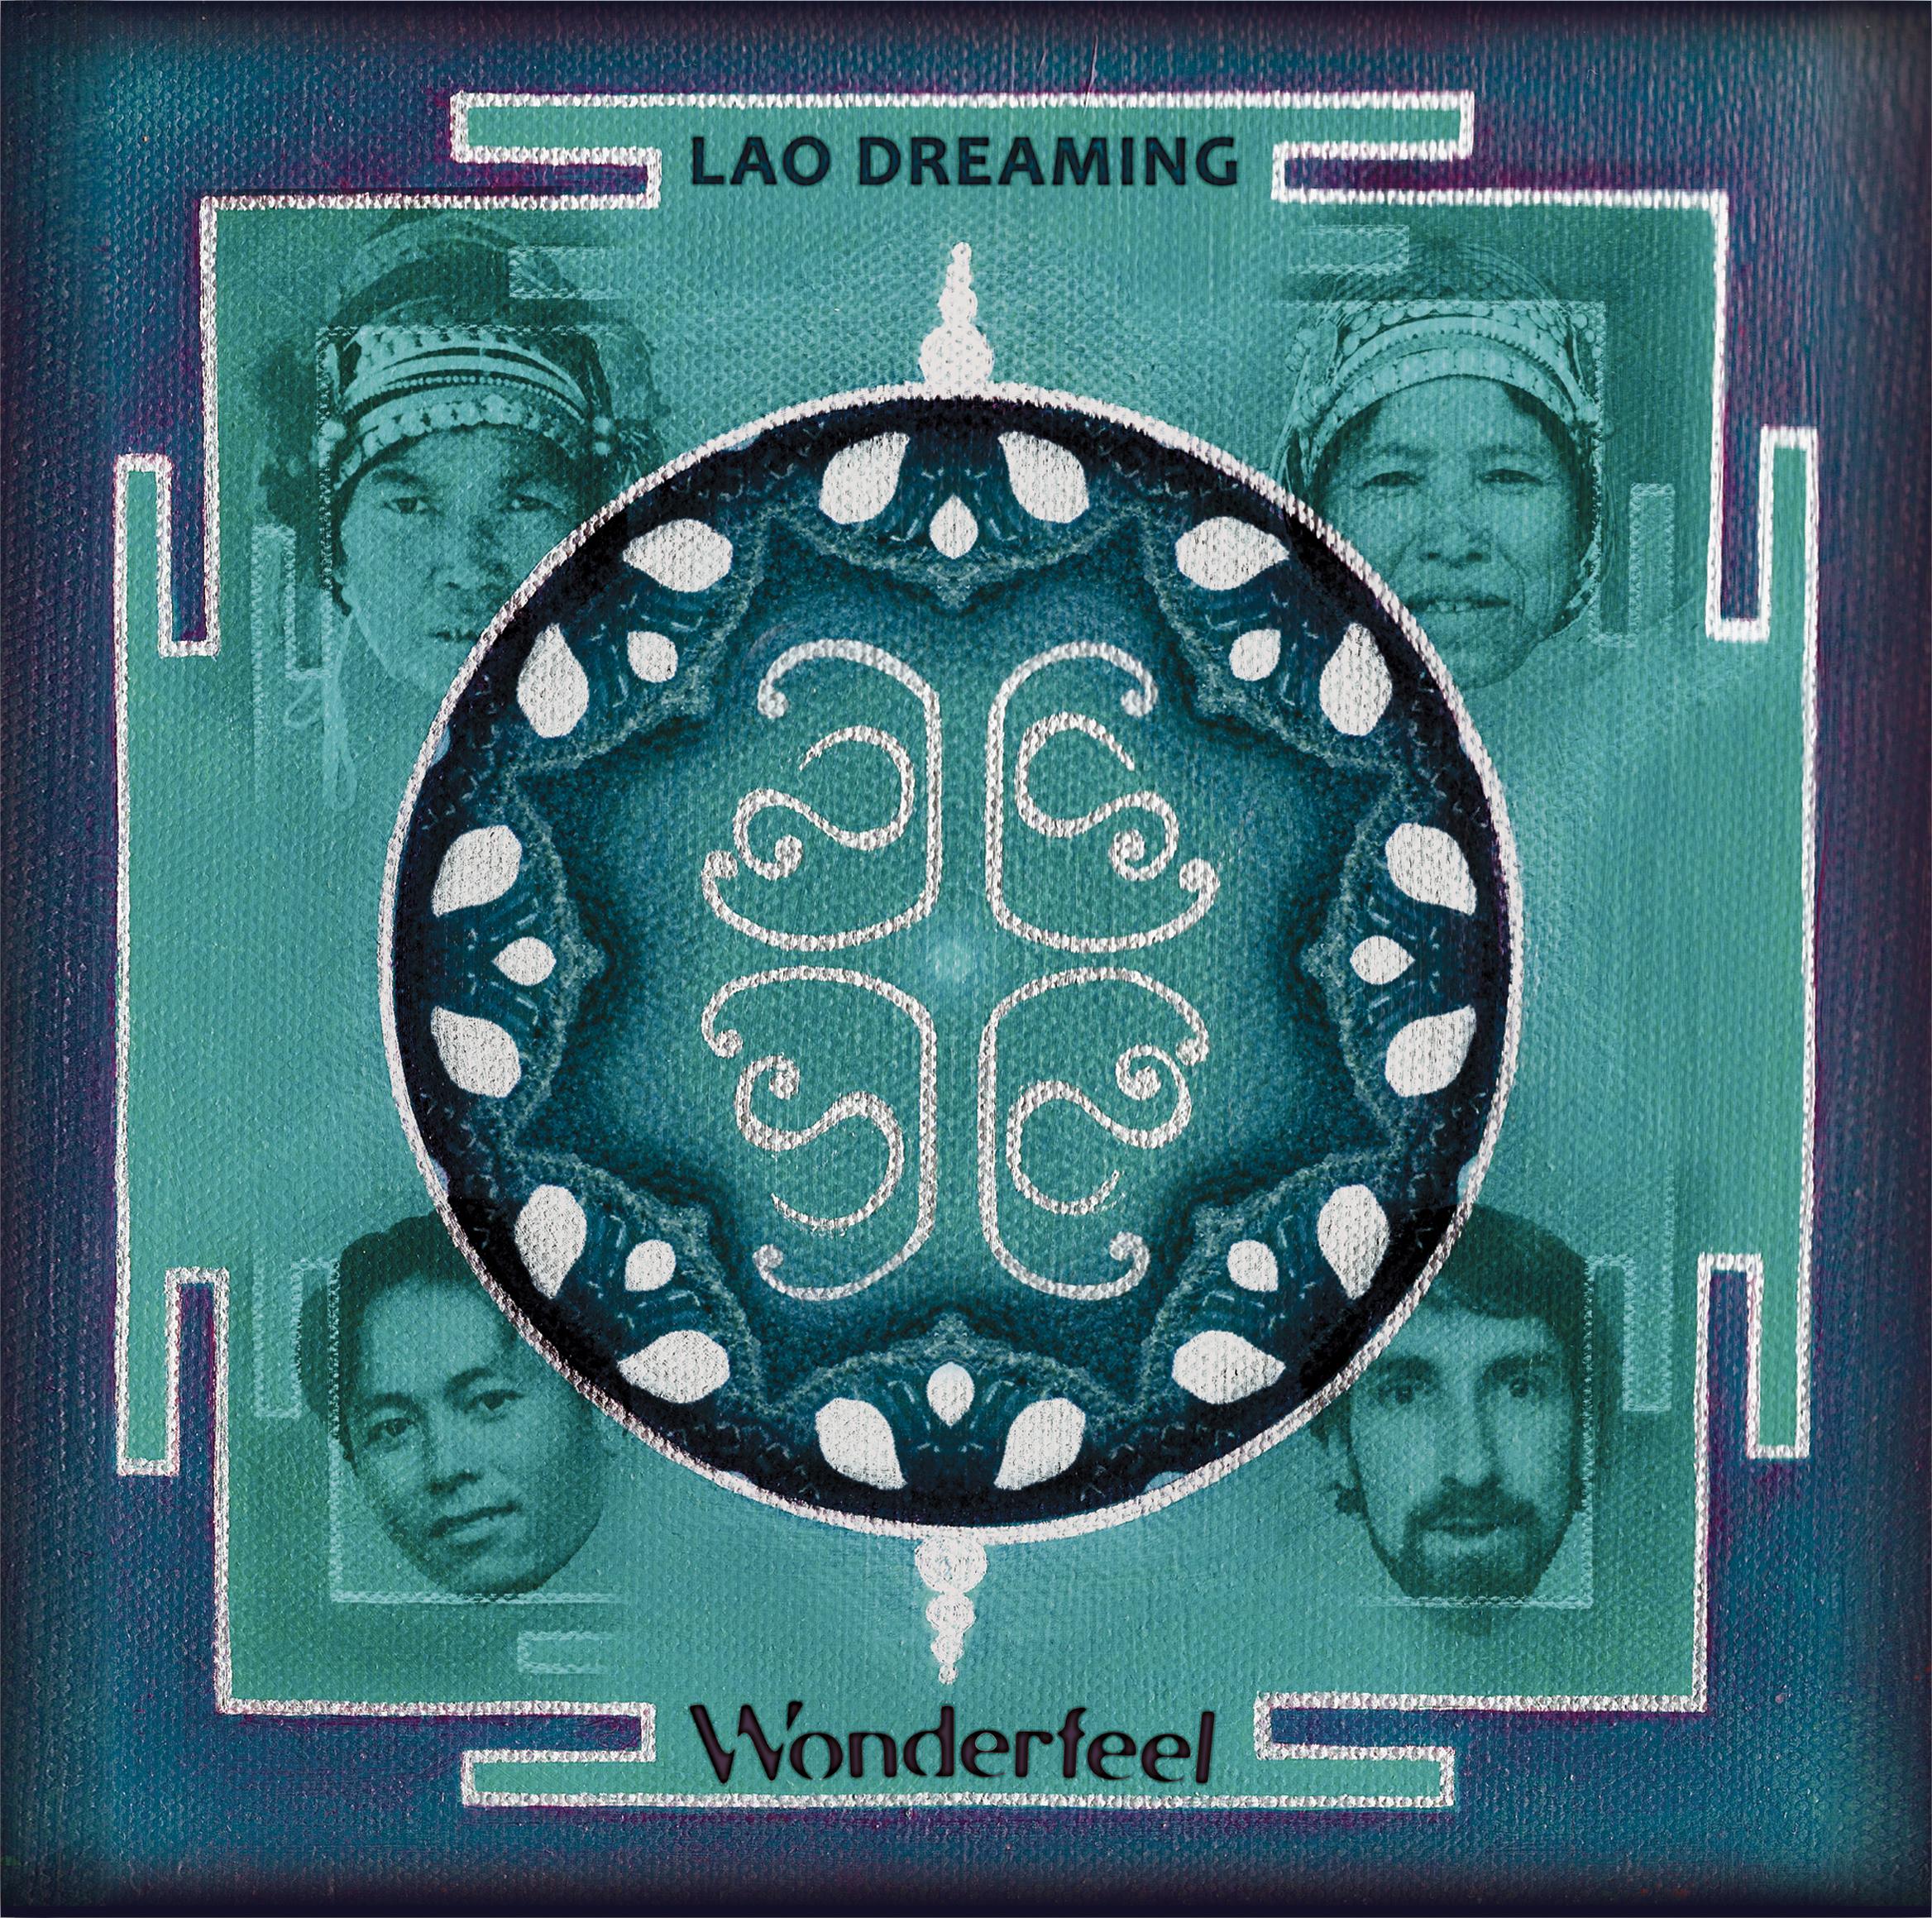 Wonderfeel laodreamingcoverart